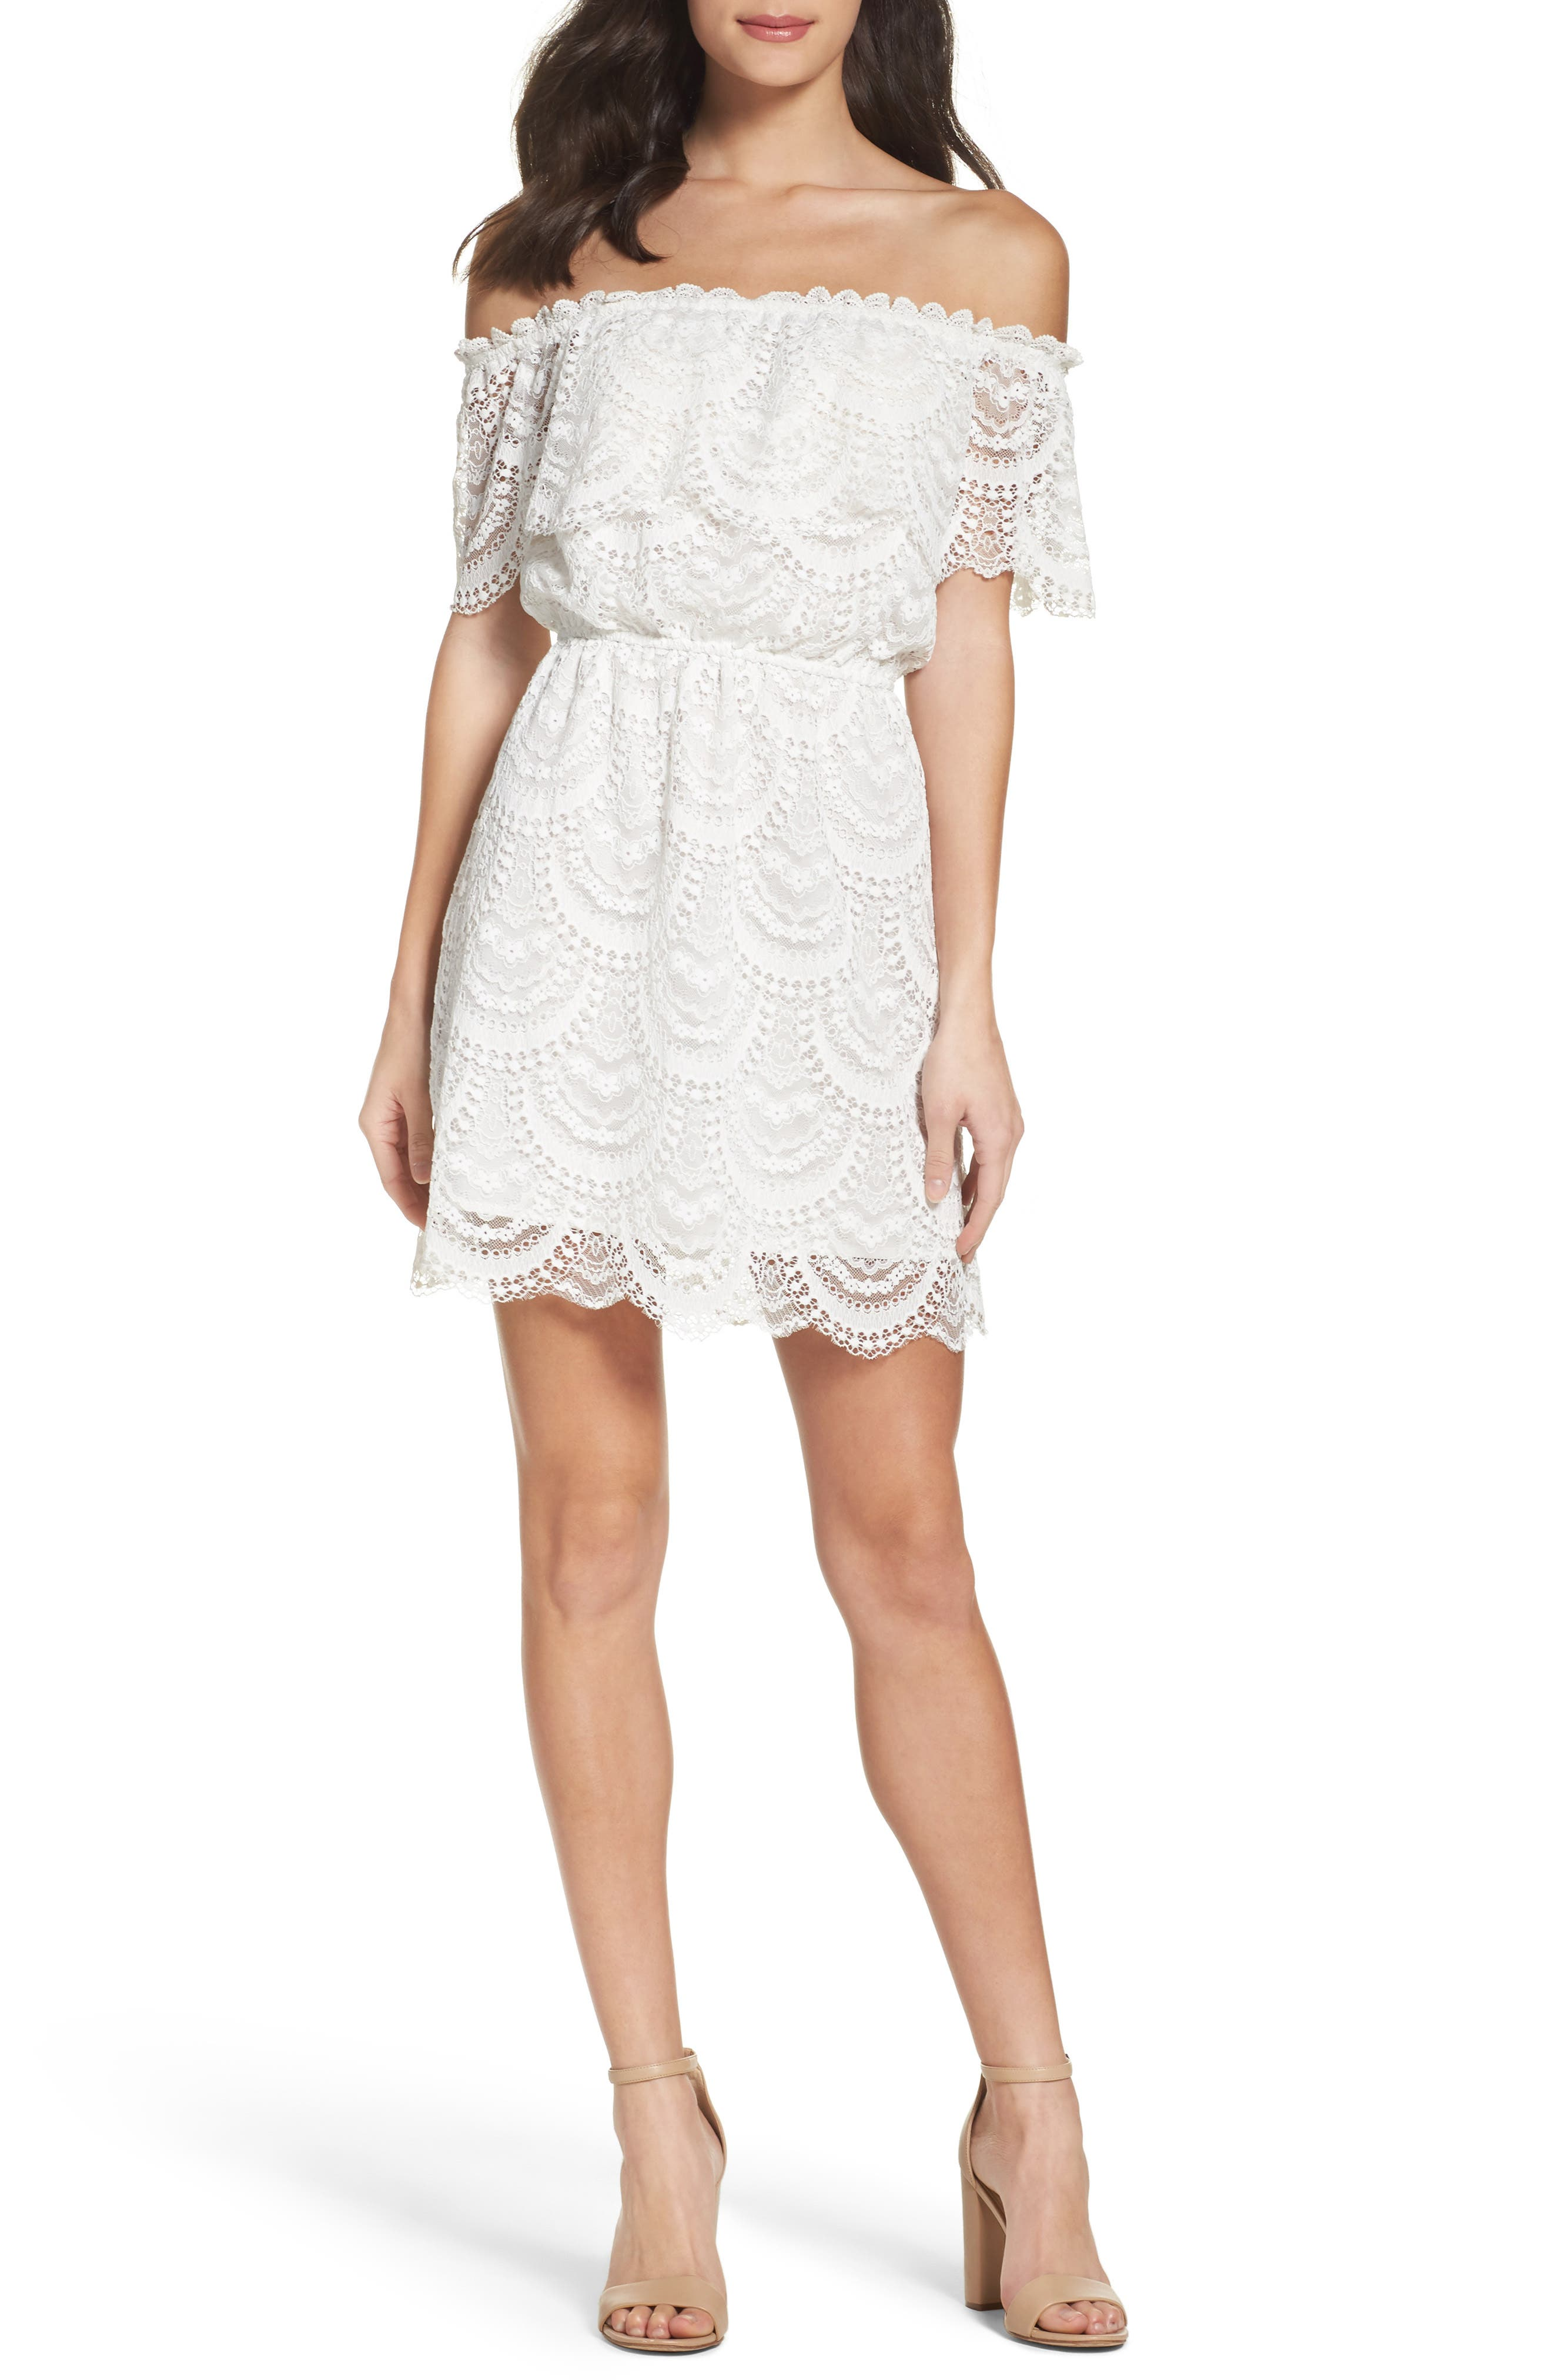 BB Dakota Hope Off the Shoulder Lace Dress